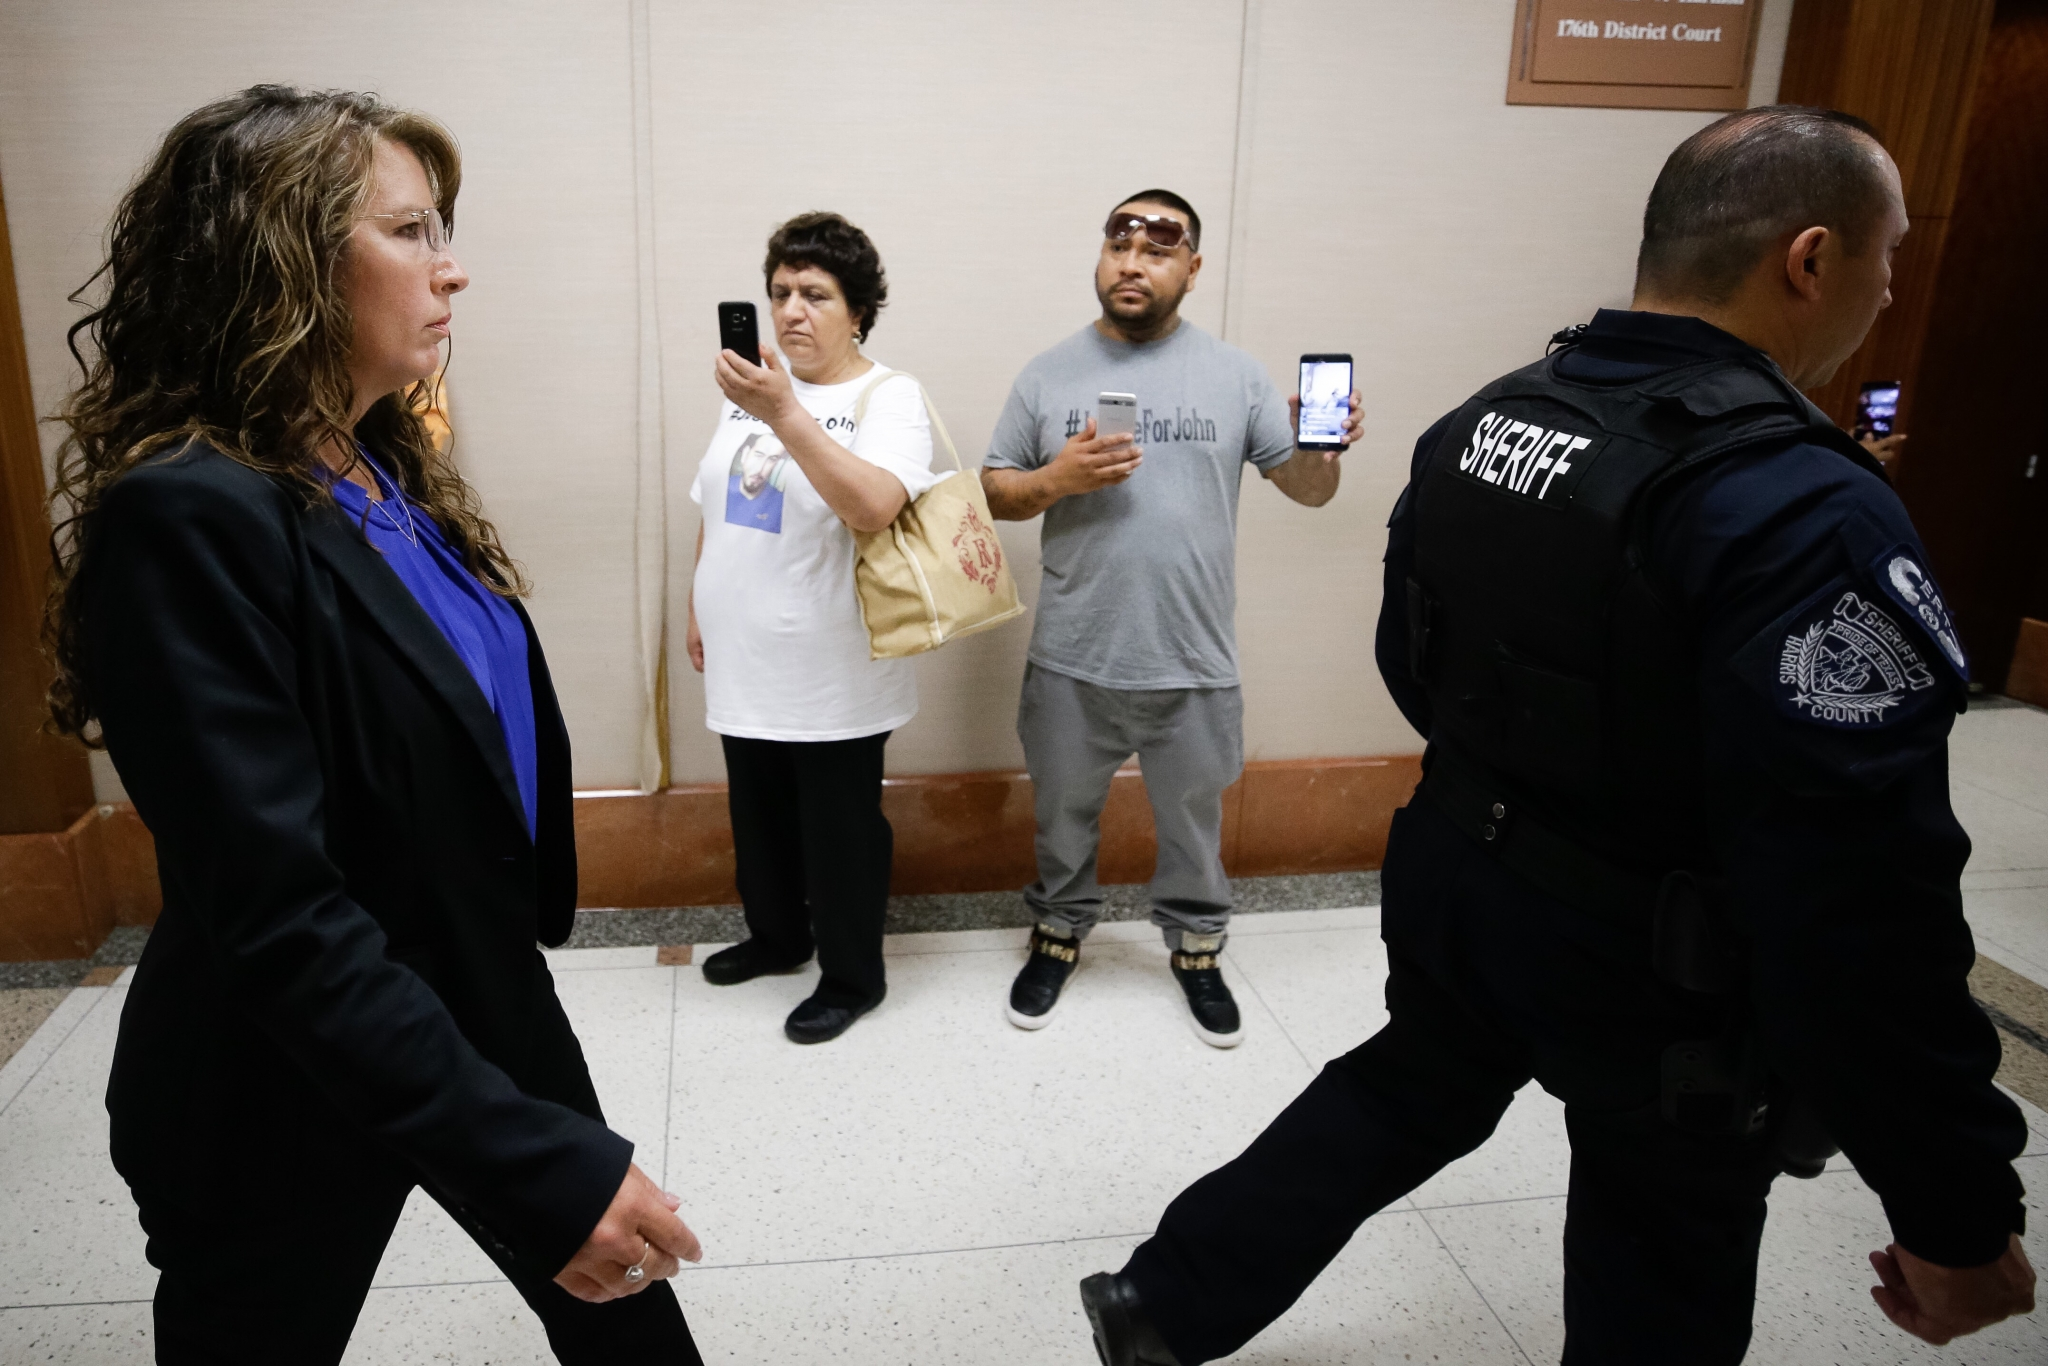 John hernandez state farm agent - Deputy Husband Could Face Criminal Civil Penalties Over Denny S Choking Death Houston Chronicle